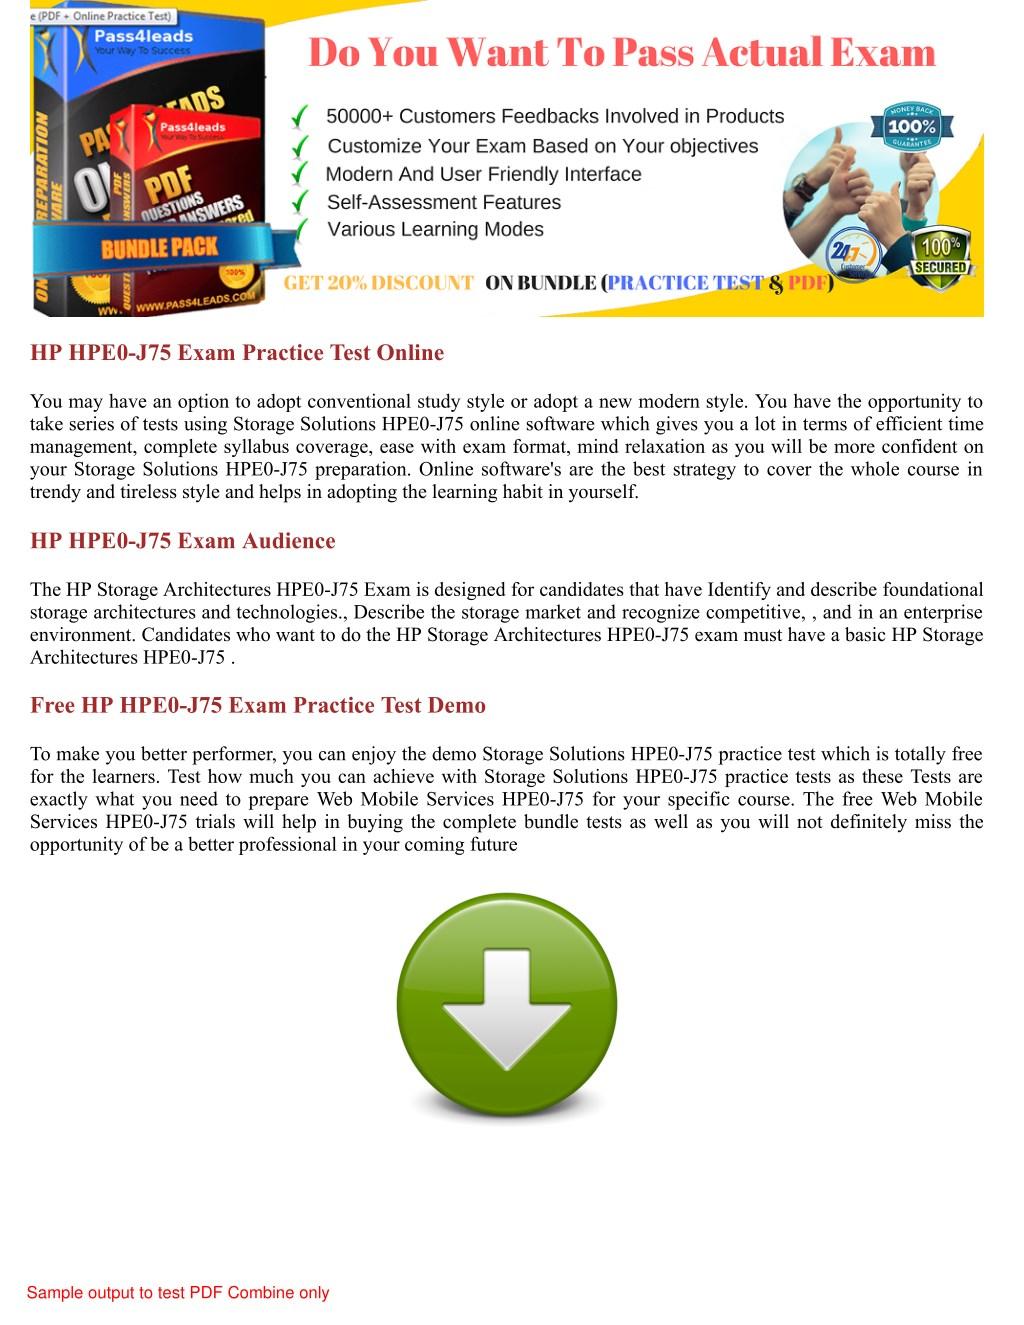 PPT - HPE0-J75 HP Braindumps with Actual HPE0-J75 PDF Dumps